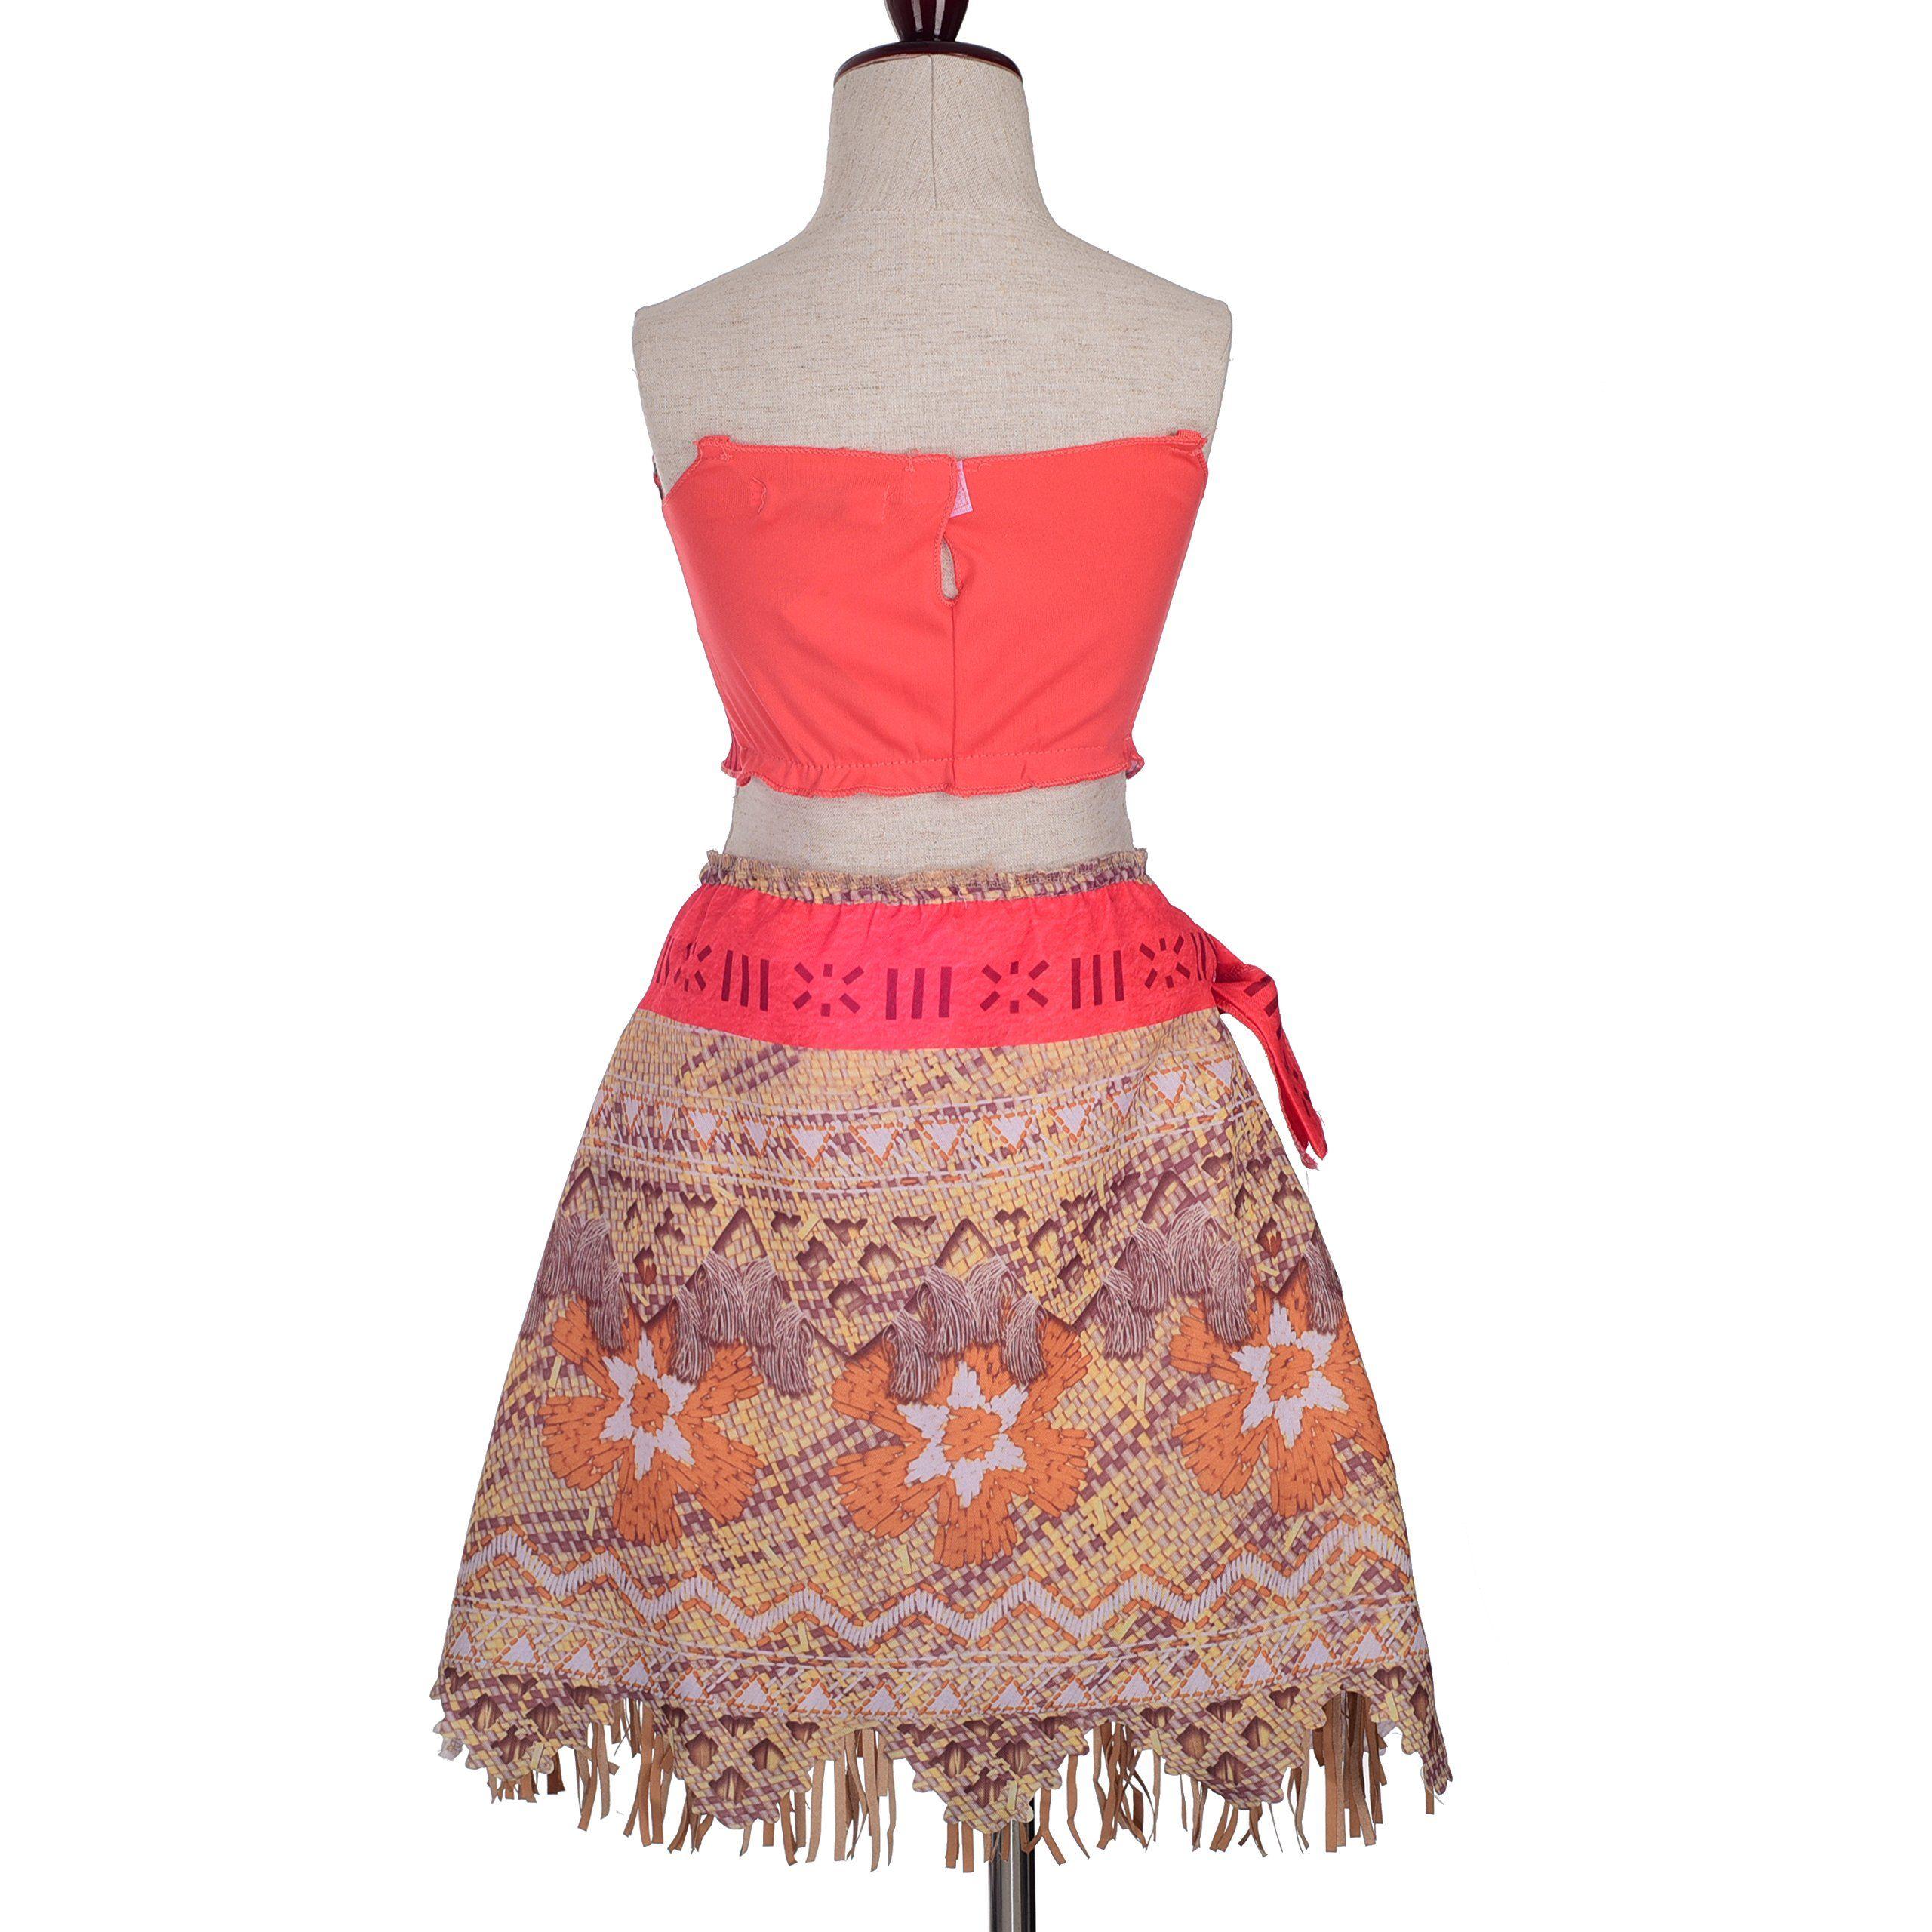 Dressy Daisy Girls Adventure Princess Moana Costumes Skirt Set Halloween Dress Up